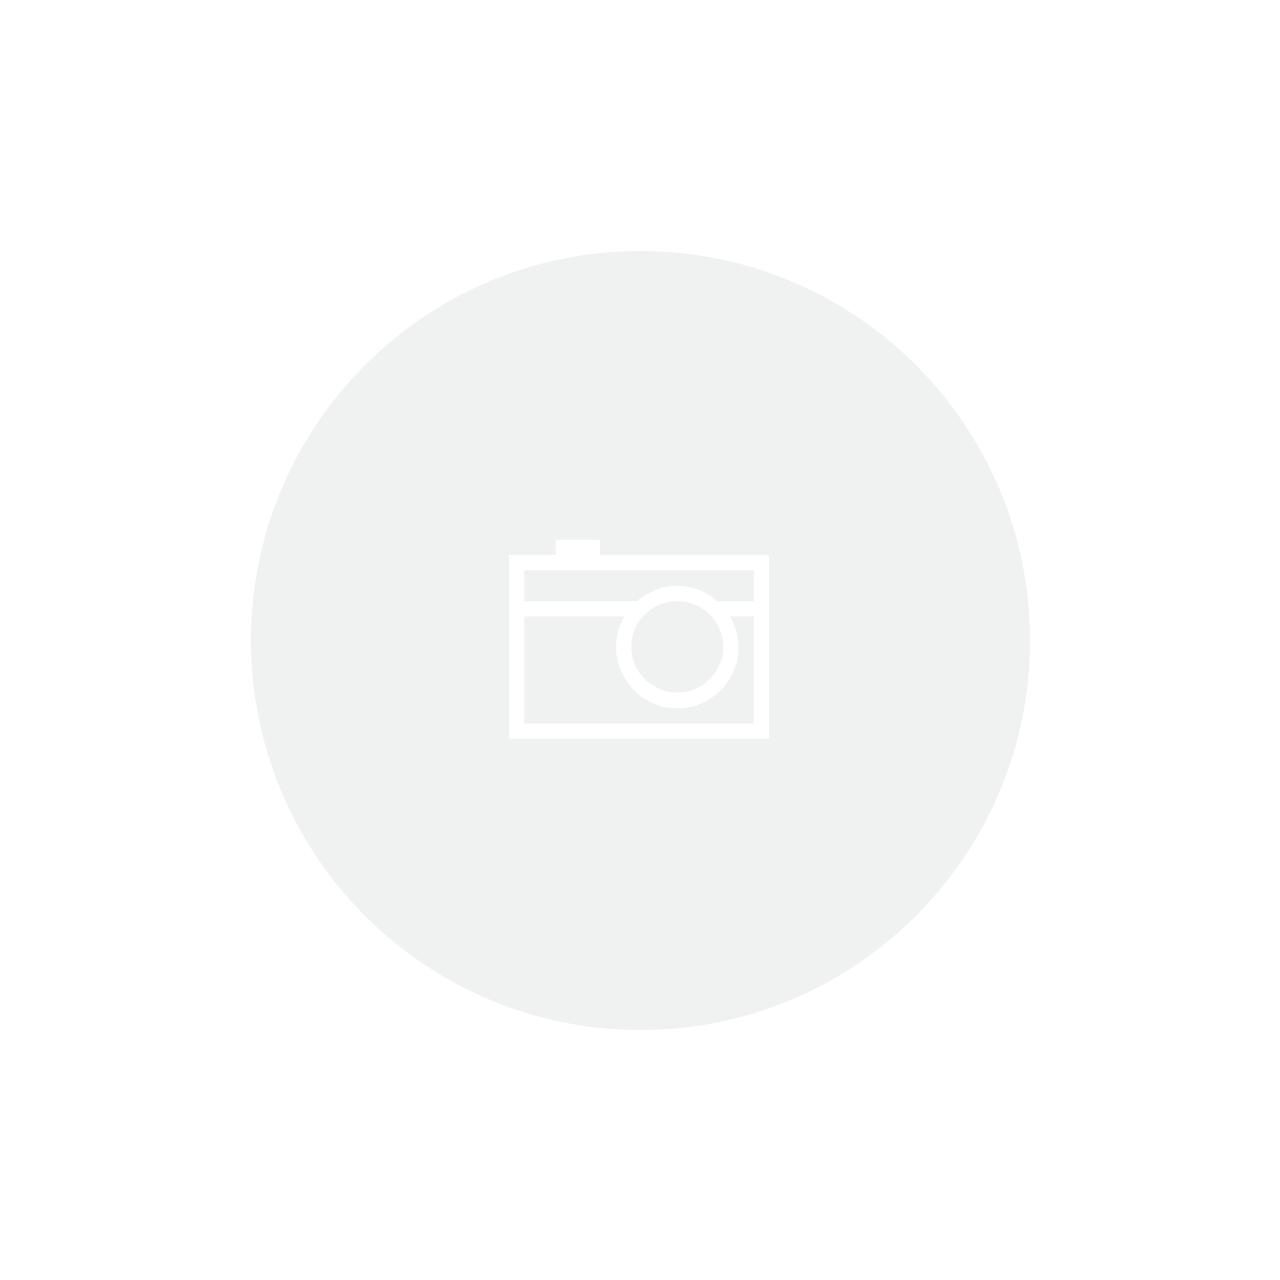 PC Gamer InfoParts Axiom - Intel CORE I3-8100, GTX 1650 4GB, 1TB, 8GB, Fonte 400w, Gabinete